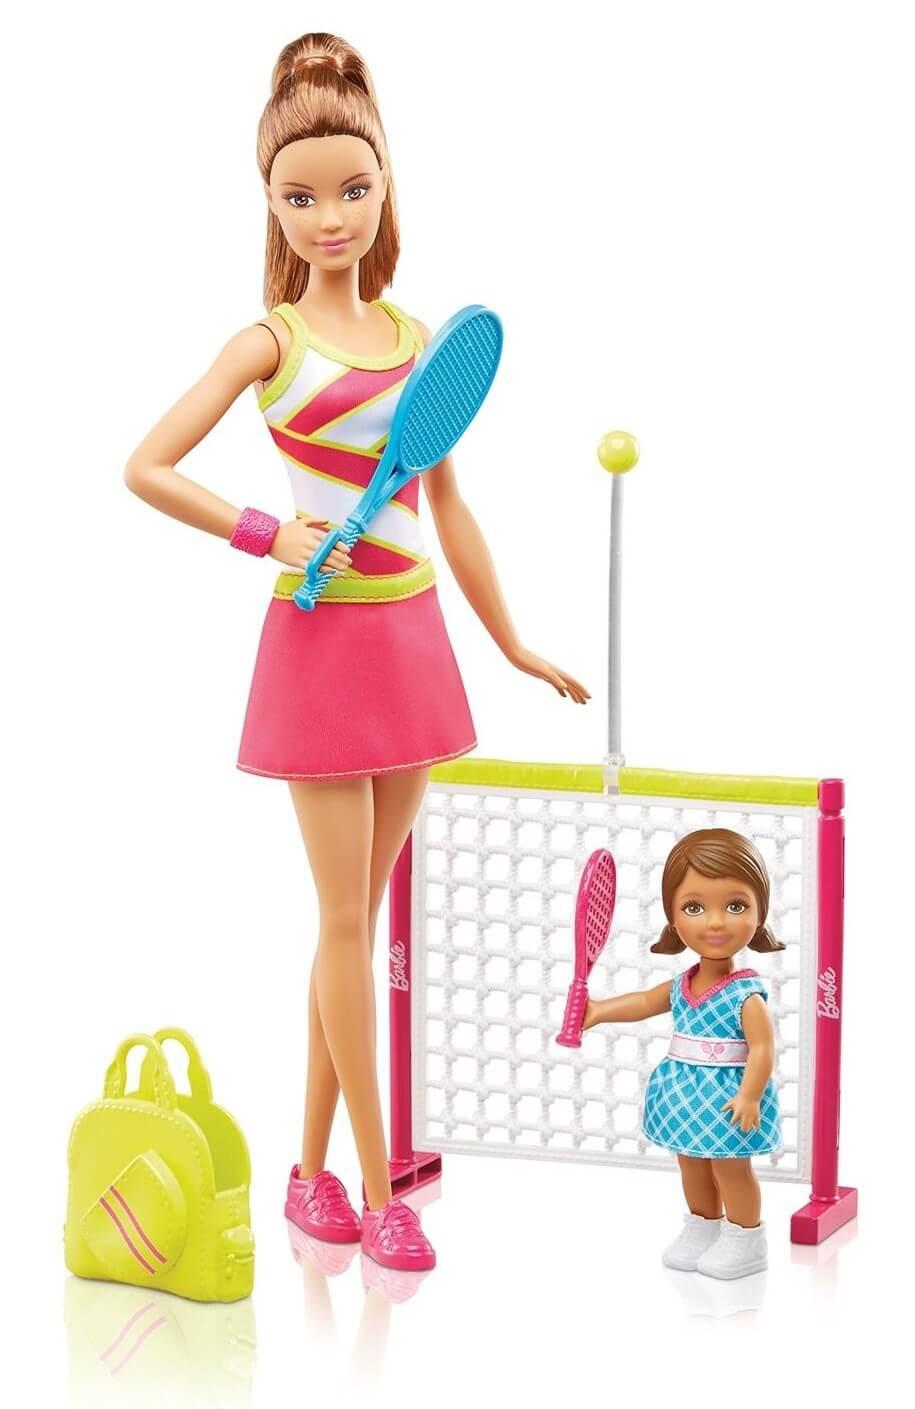 Barbie Careers Tennis Coach Playset DVG15